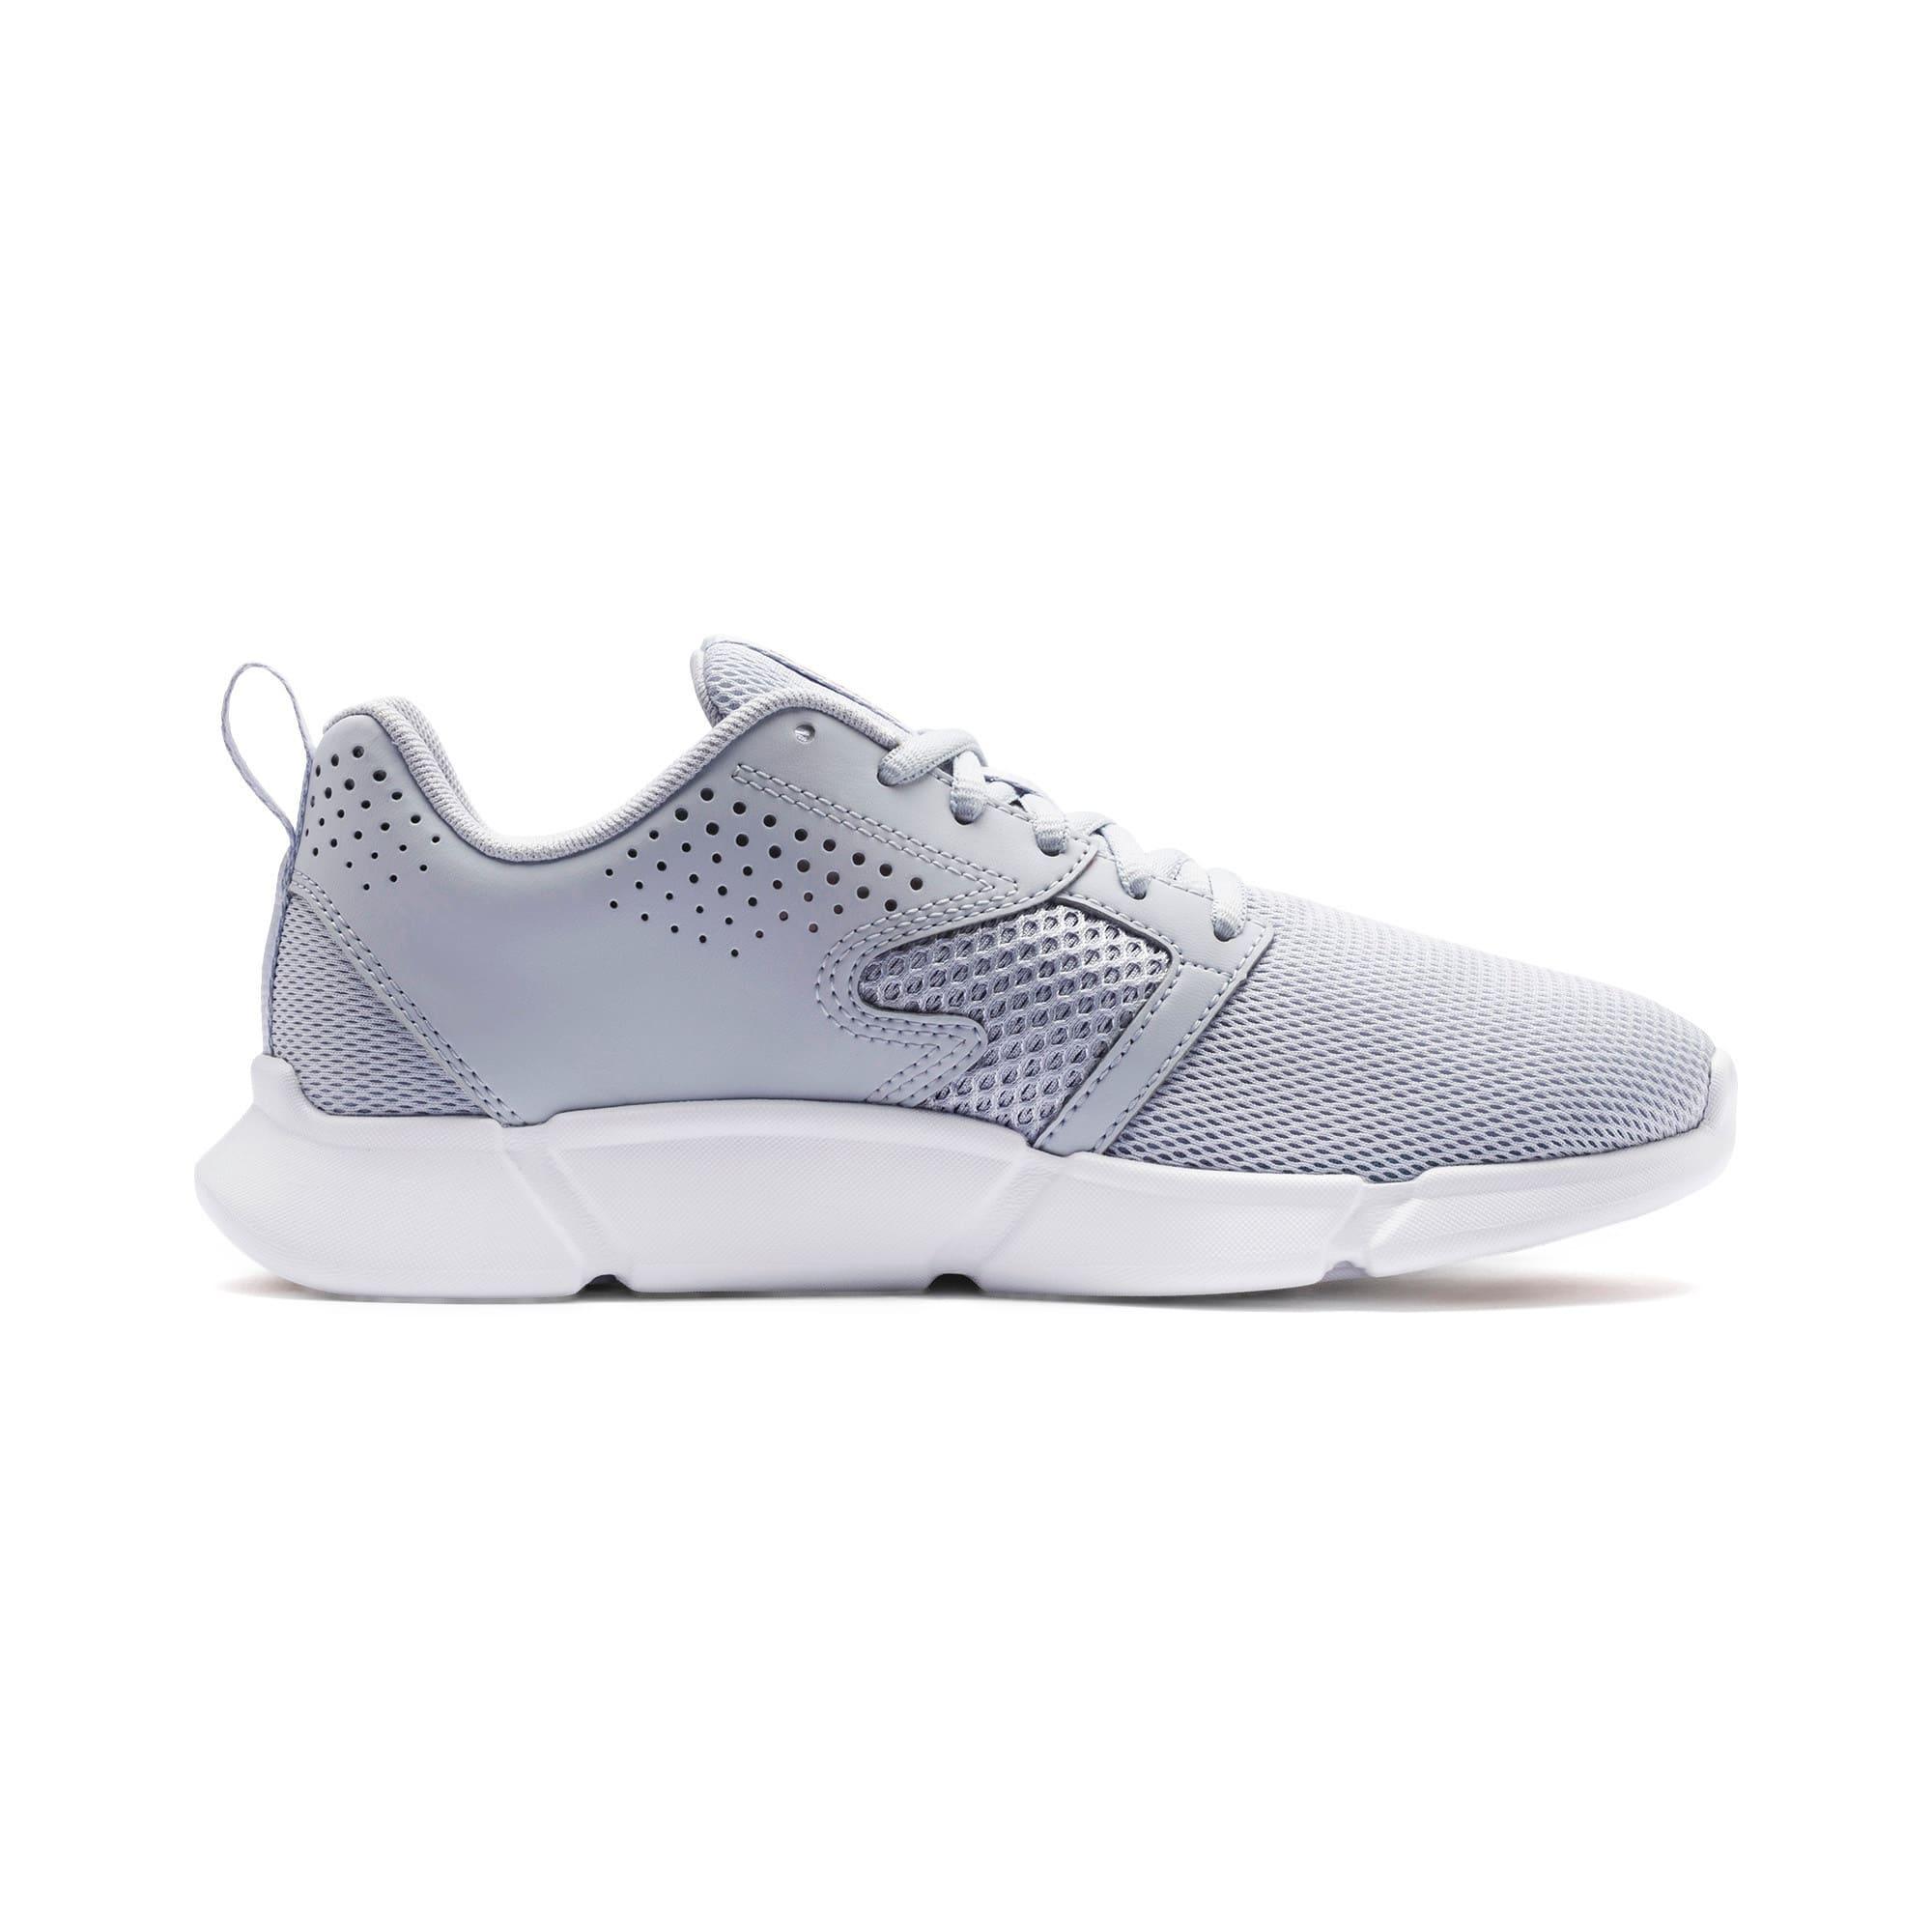 Thumbnail 5 of INTERFLEX Modern Running Shoes, Grey Dawn-Bridal Rose, medium-IND